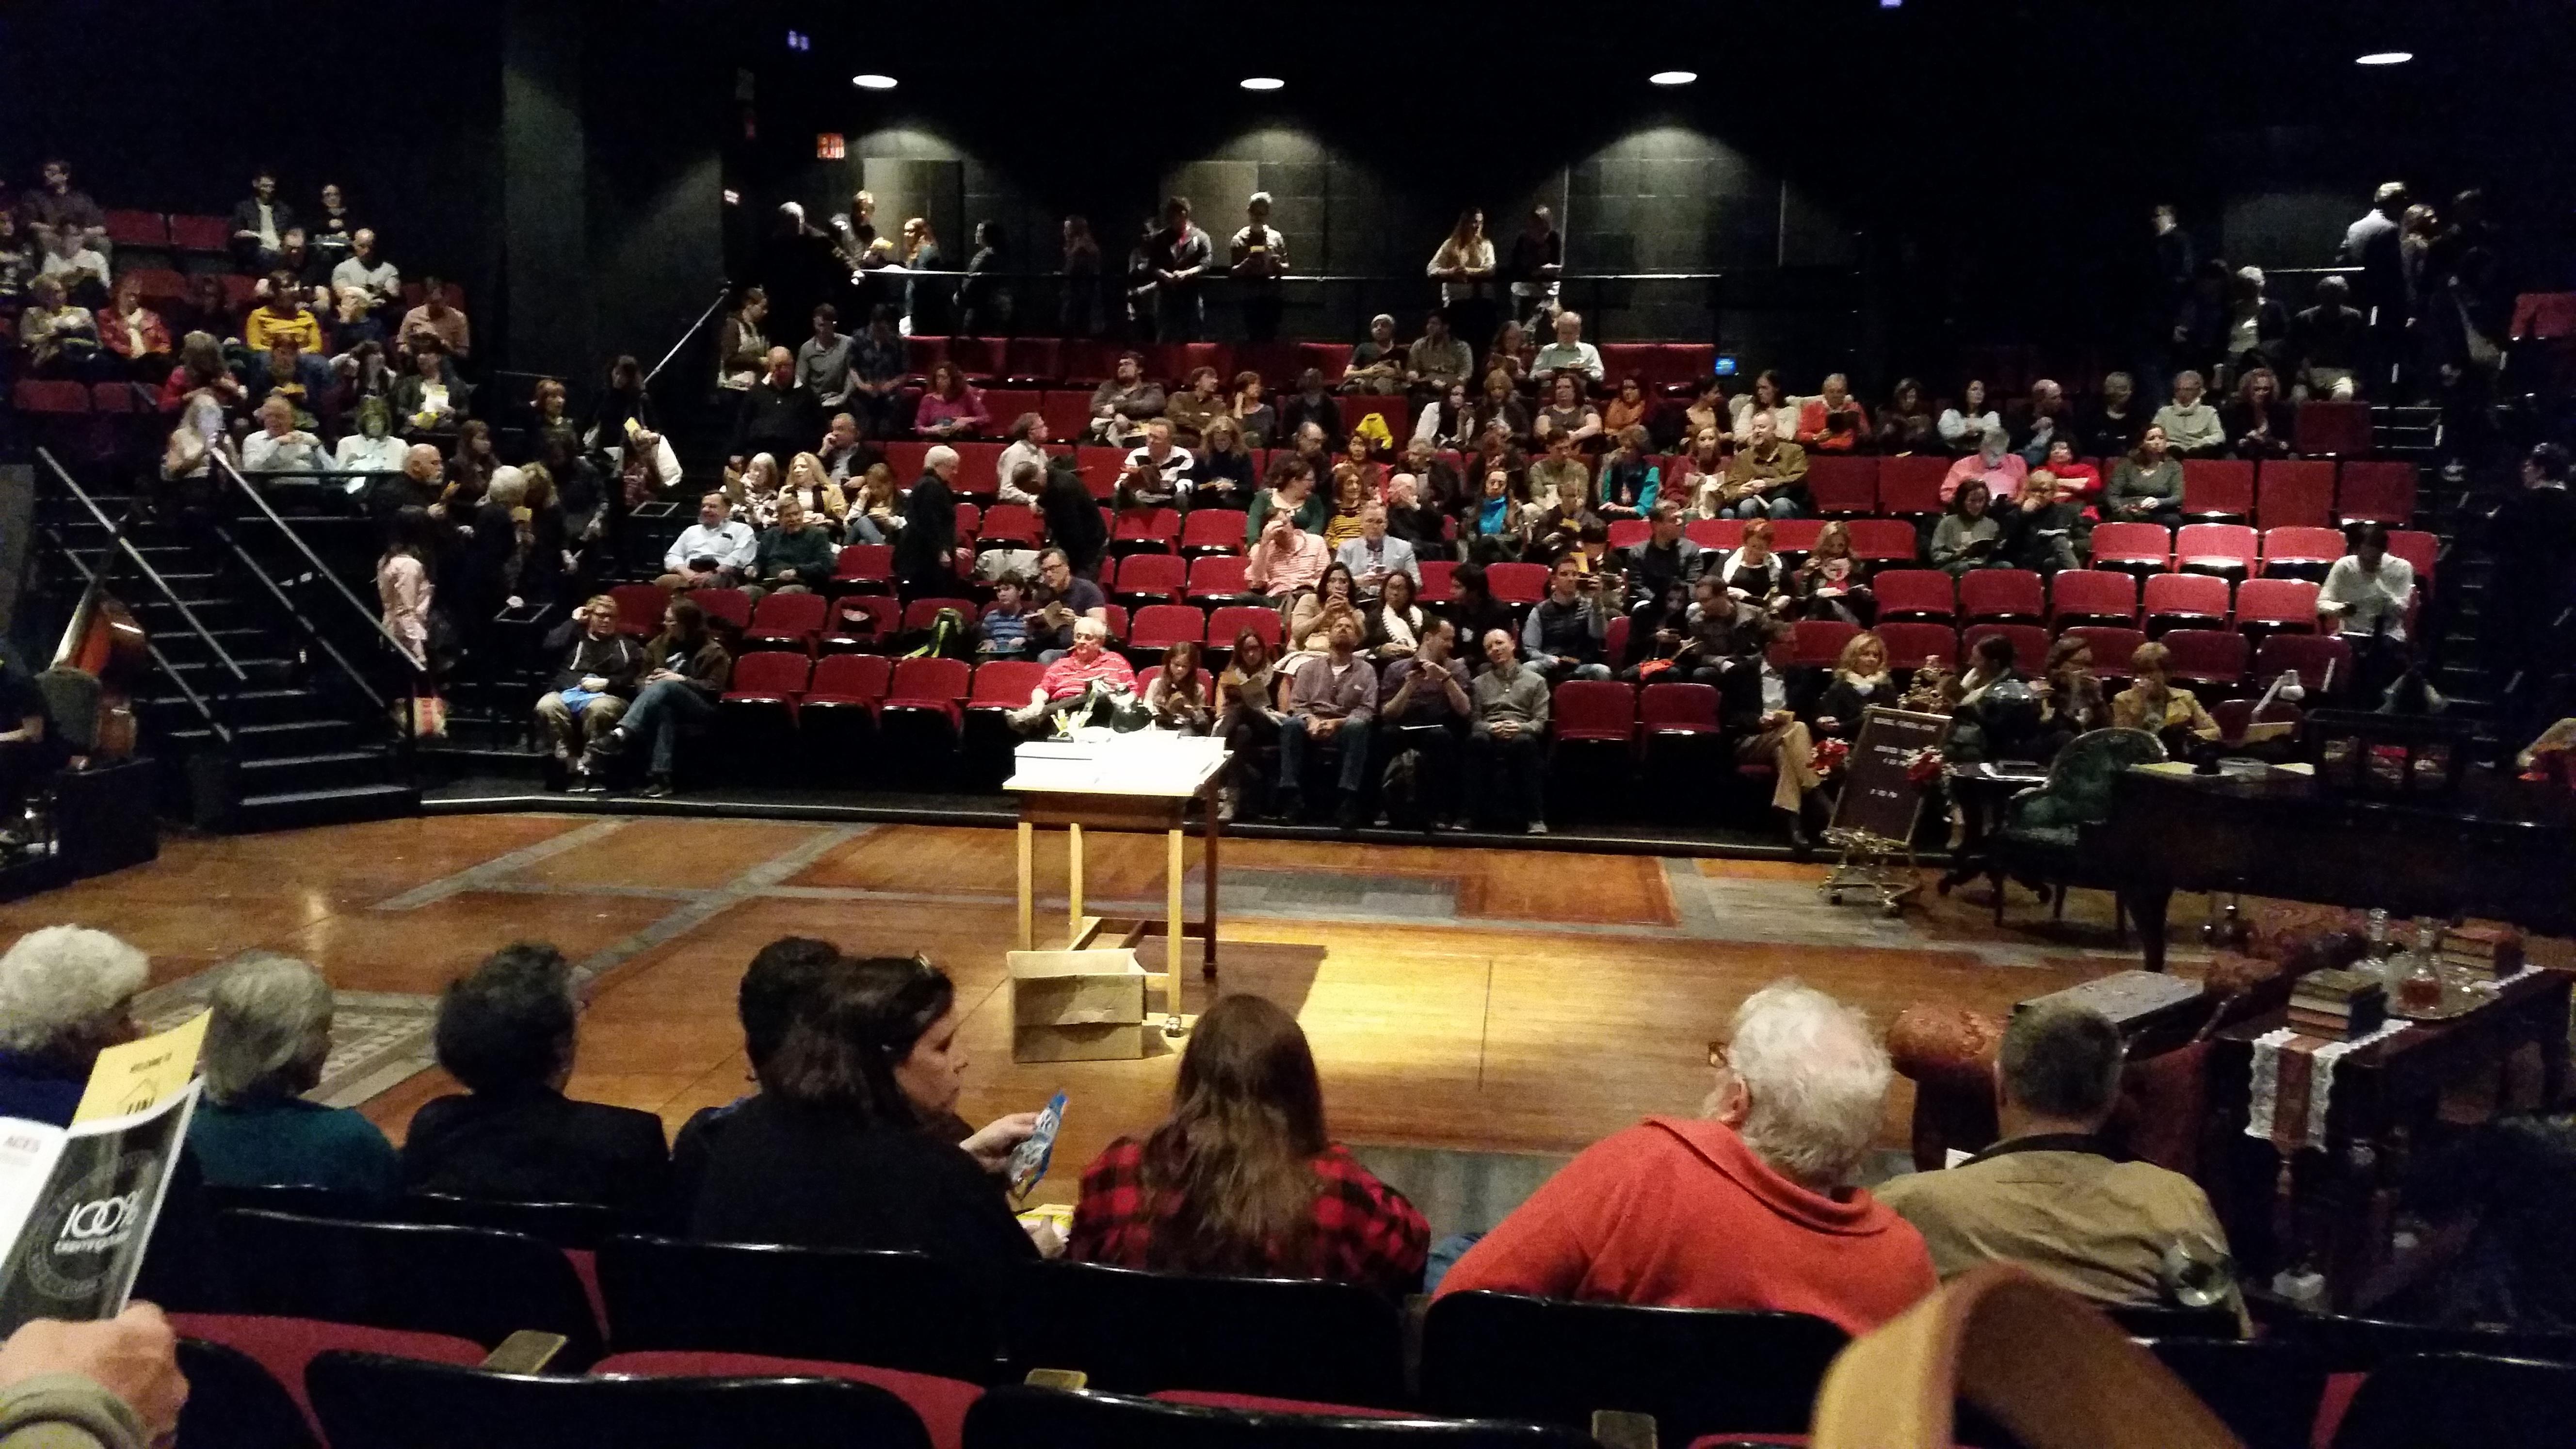 Circle in the Square Theatre Section Orchestra 200 (Odd) Row E Seat 223